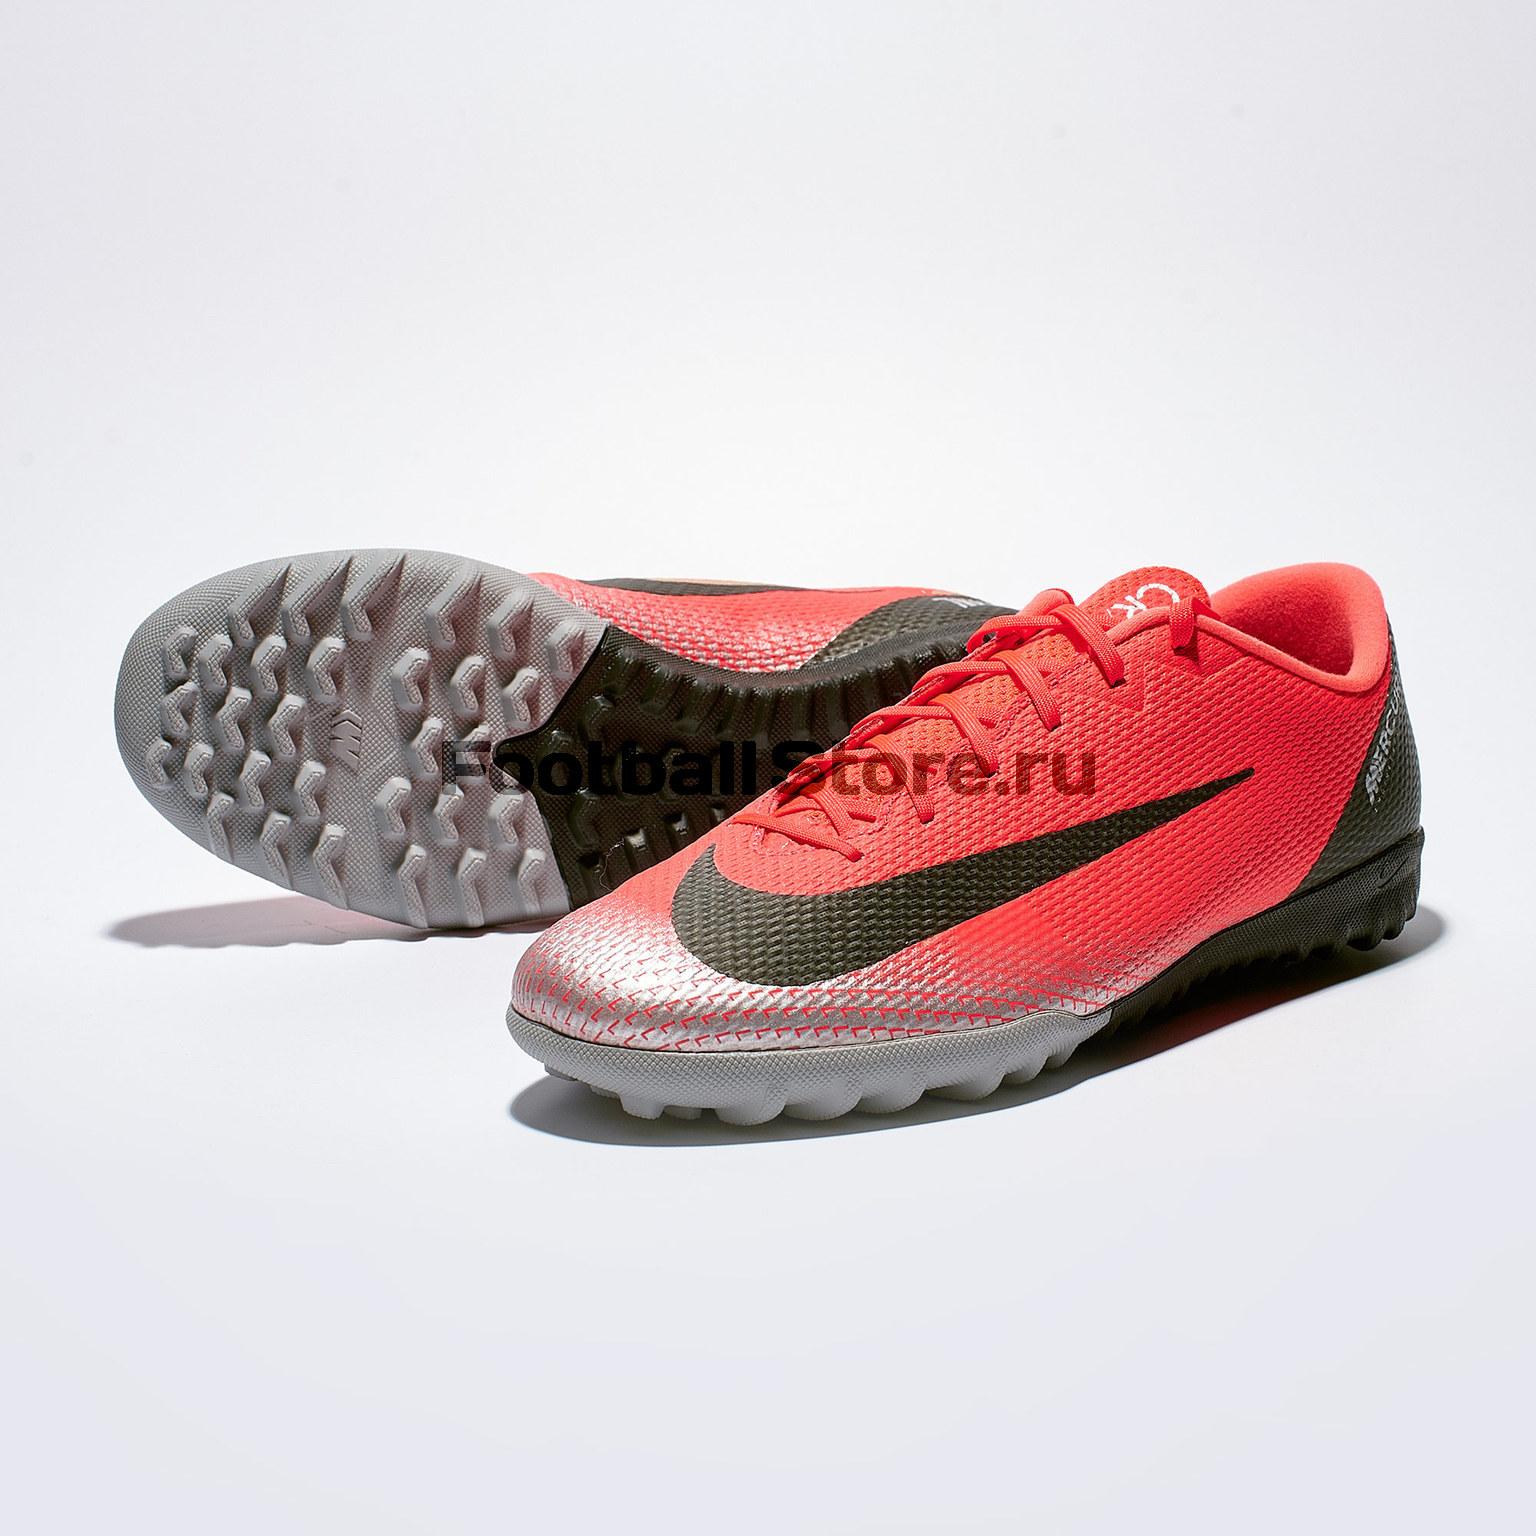 Шиповки Nike Vapor 12 Academy CR7 TF AJ3732-600 шиповки nike elastico finale iii tf 685358 480 8 5 синий